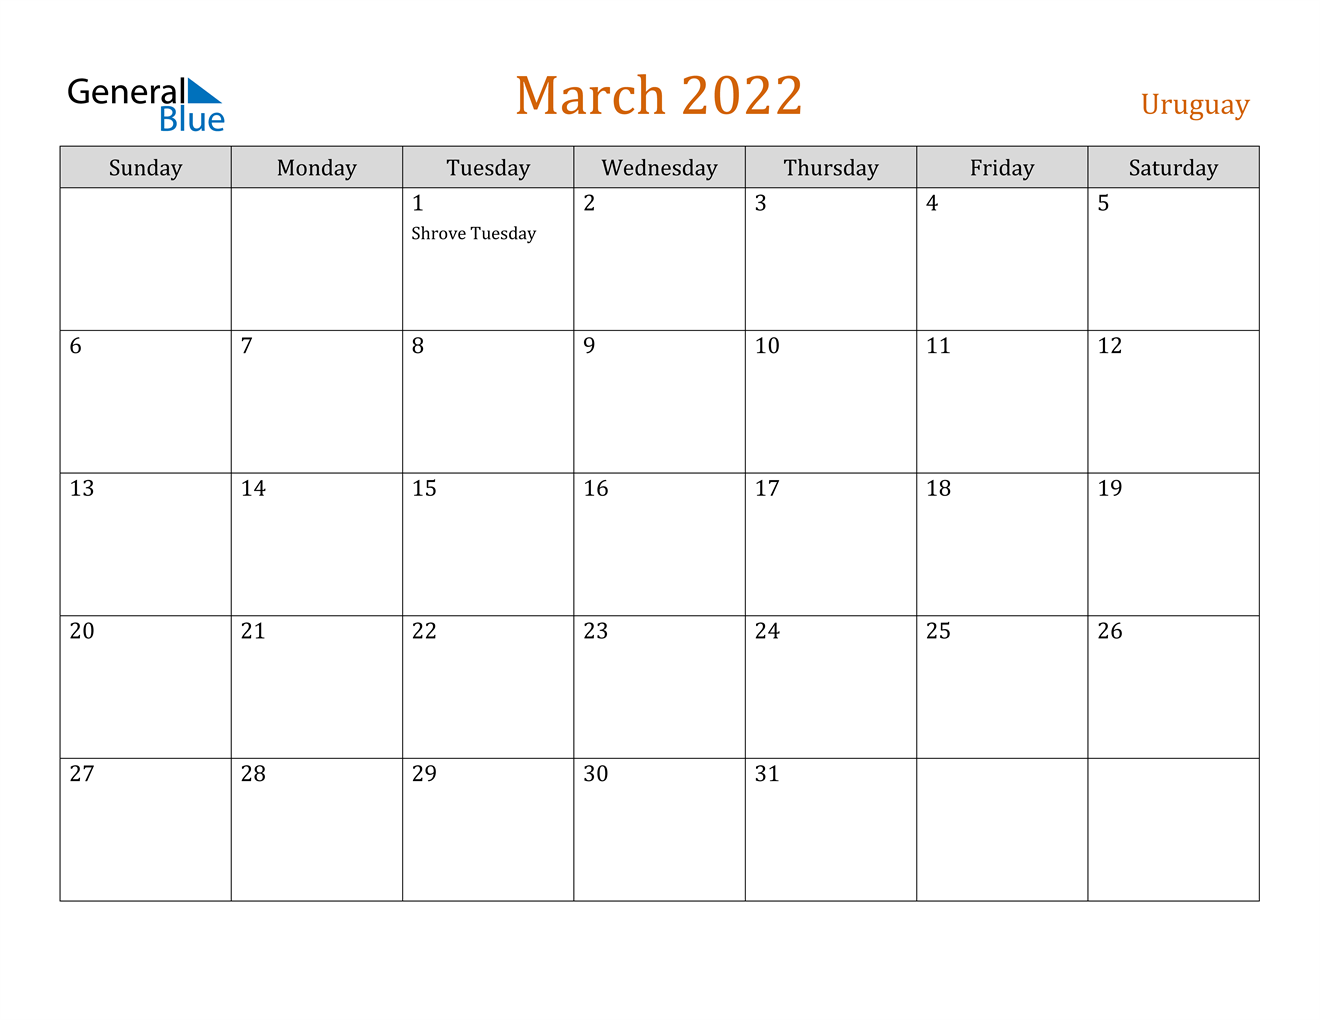 March 2022 Calendar - Uruguay Throughout March 2022 Calendar Free Printable